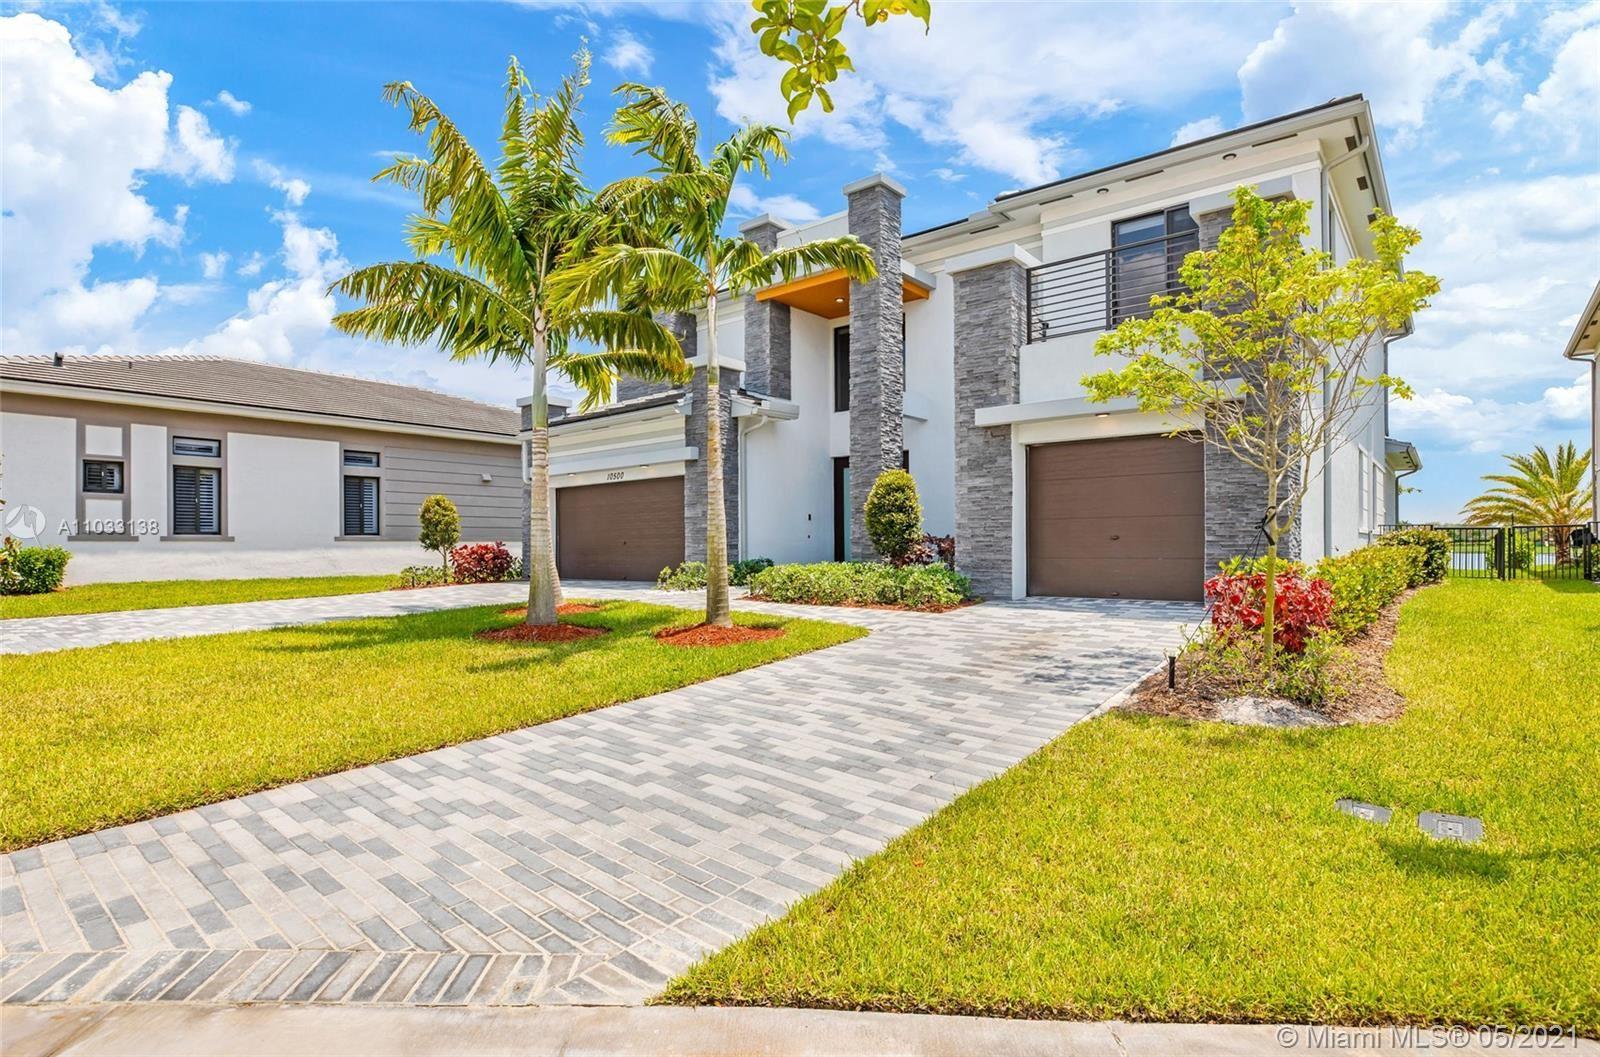 10500 Mira Vista Dr, Parkland, FL 33076 - #: A11033138